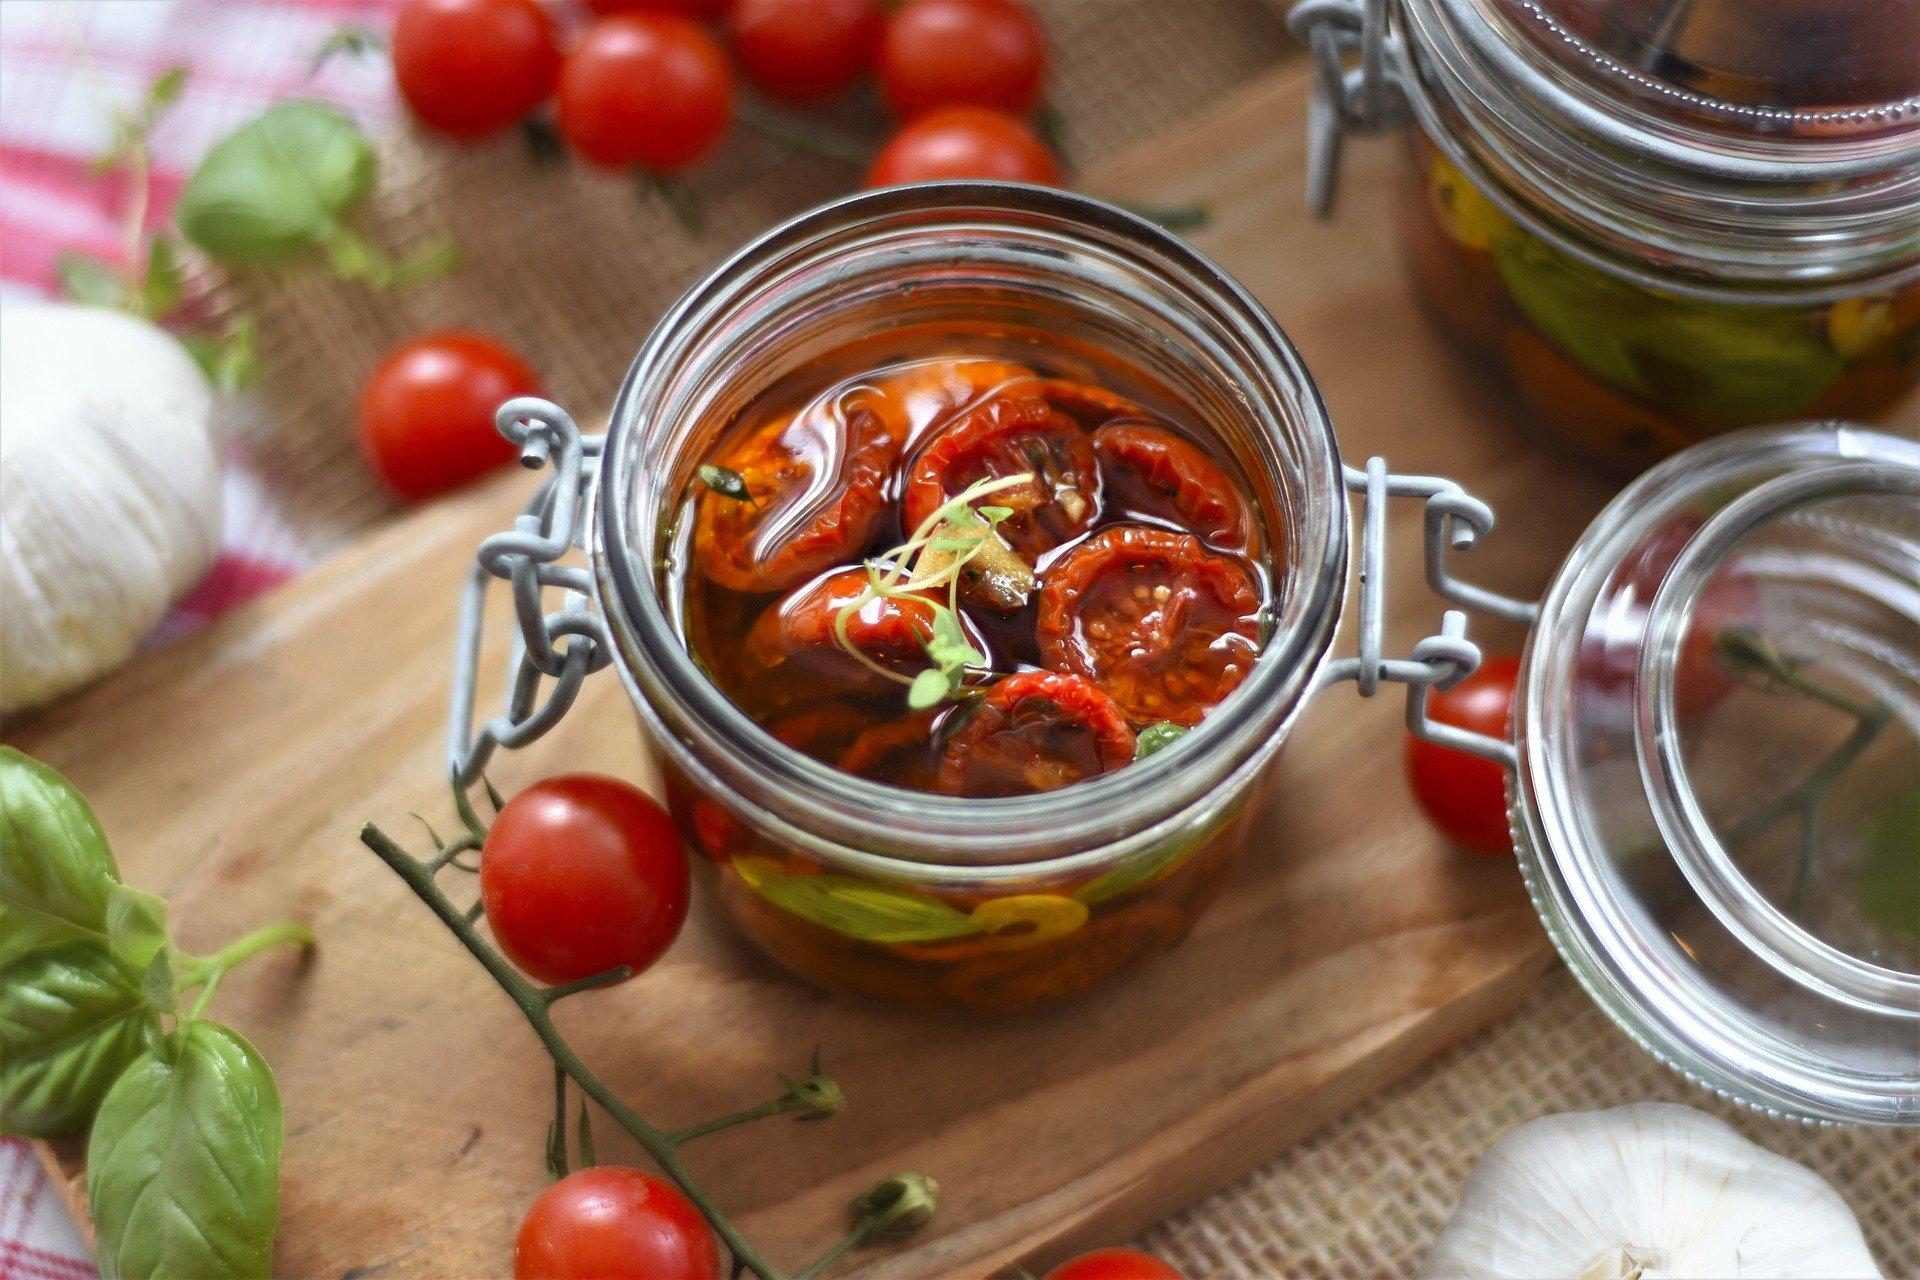 13552 tomatoes 5325850 1920